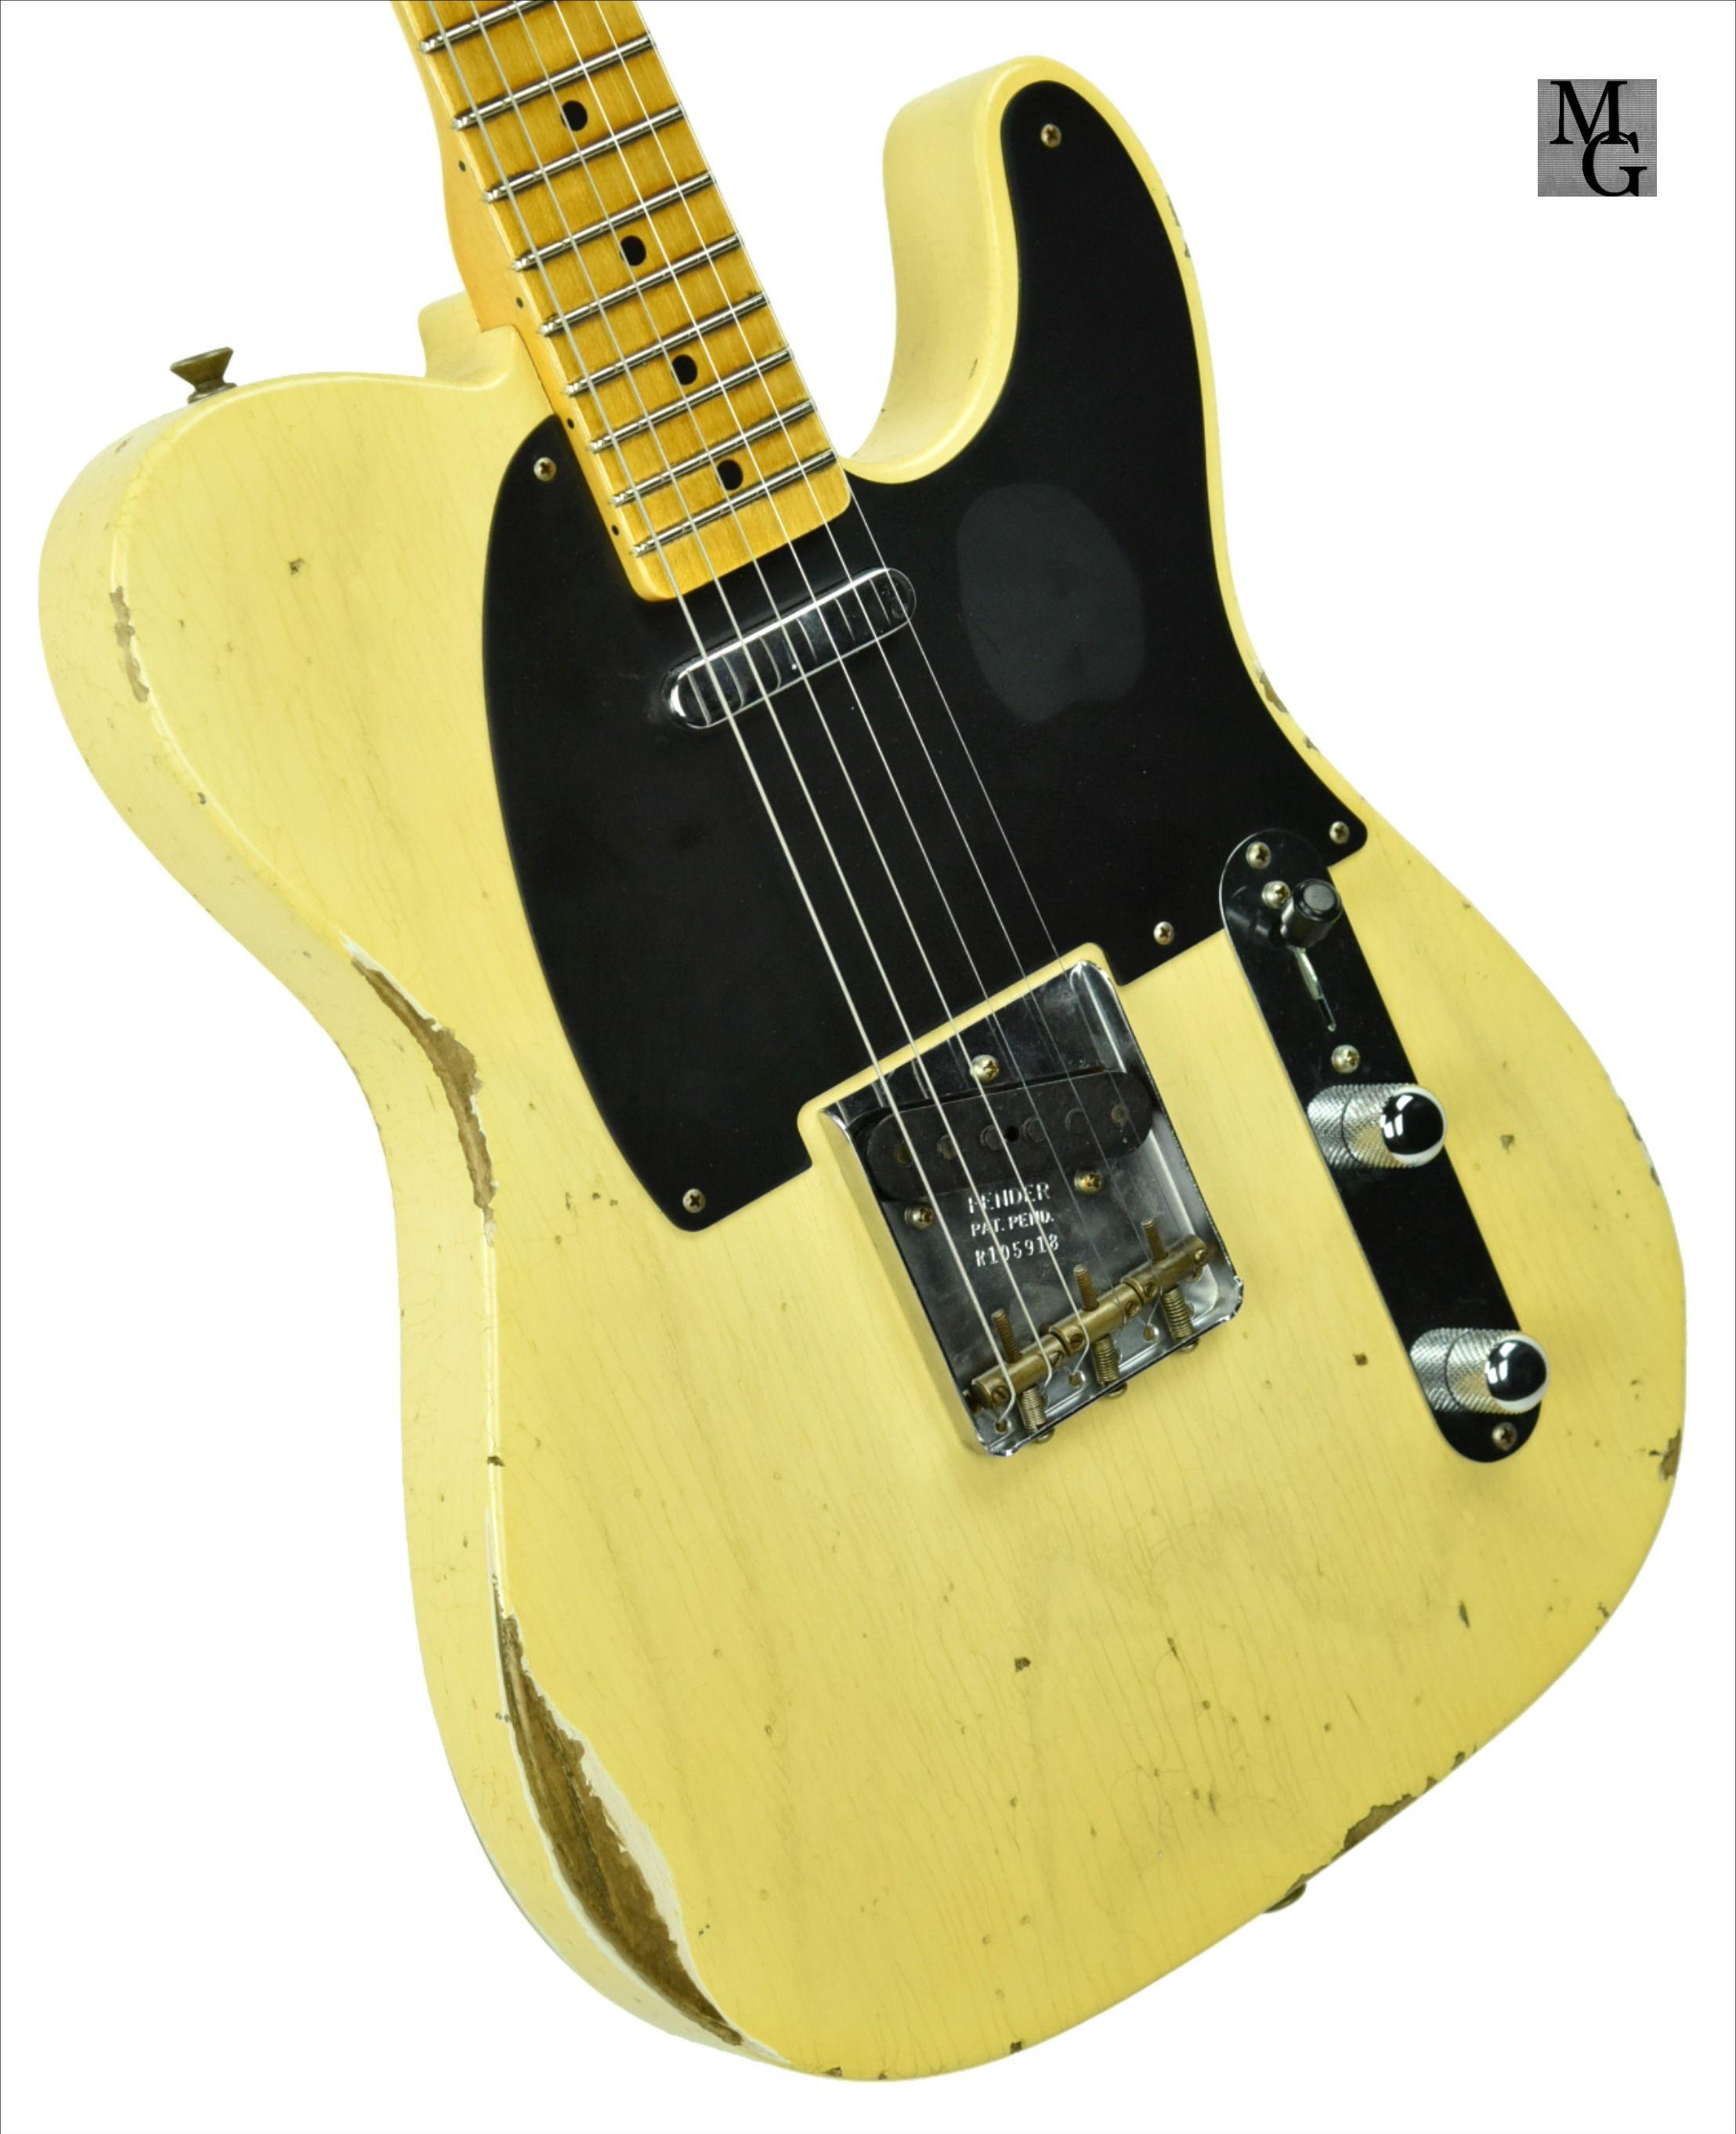 Fender Custom Shop 50s Telecaster Relic 1 Piece Ash In Faded Nocaster Blonde R105918 Telecaster Fender Custom Shop Vintage Telecaster